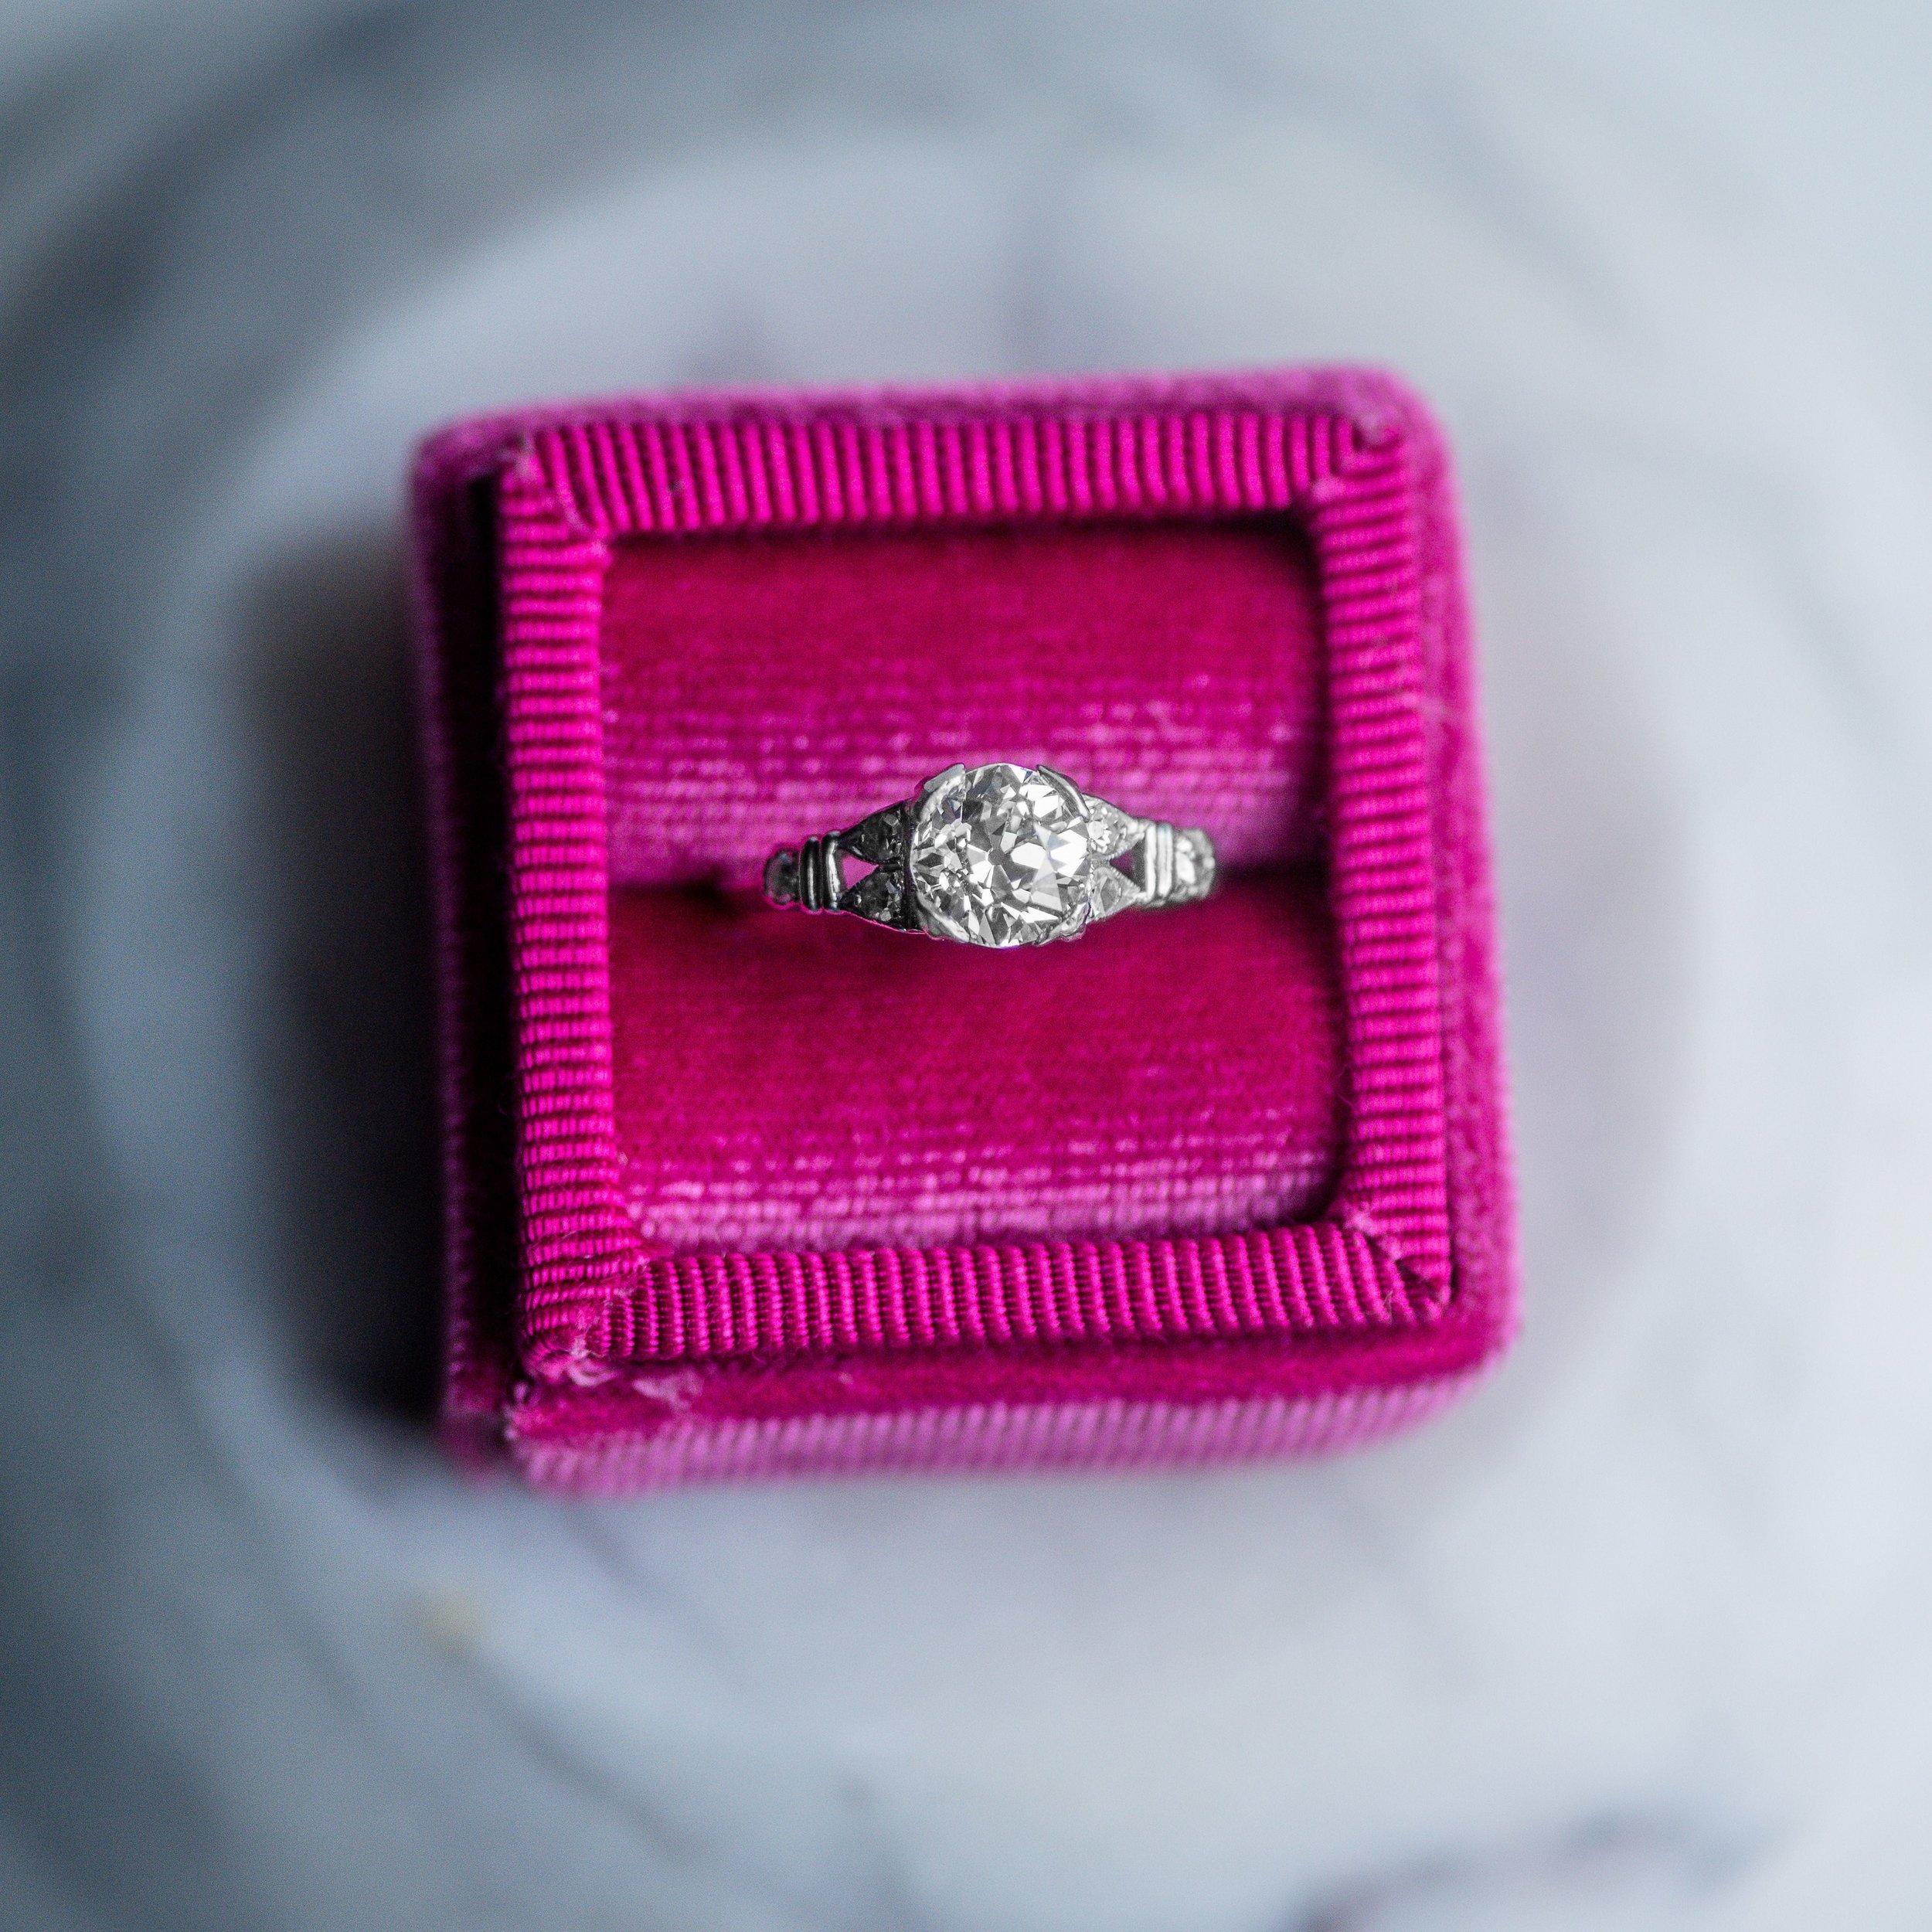 This Art Deco beauty has us feelin' hot, hot, hot!🌶 Shop this fabulous 1.06 carat Old European cut diamond ring  HERE .